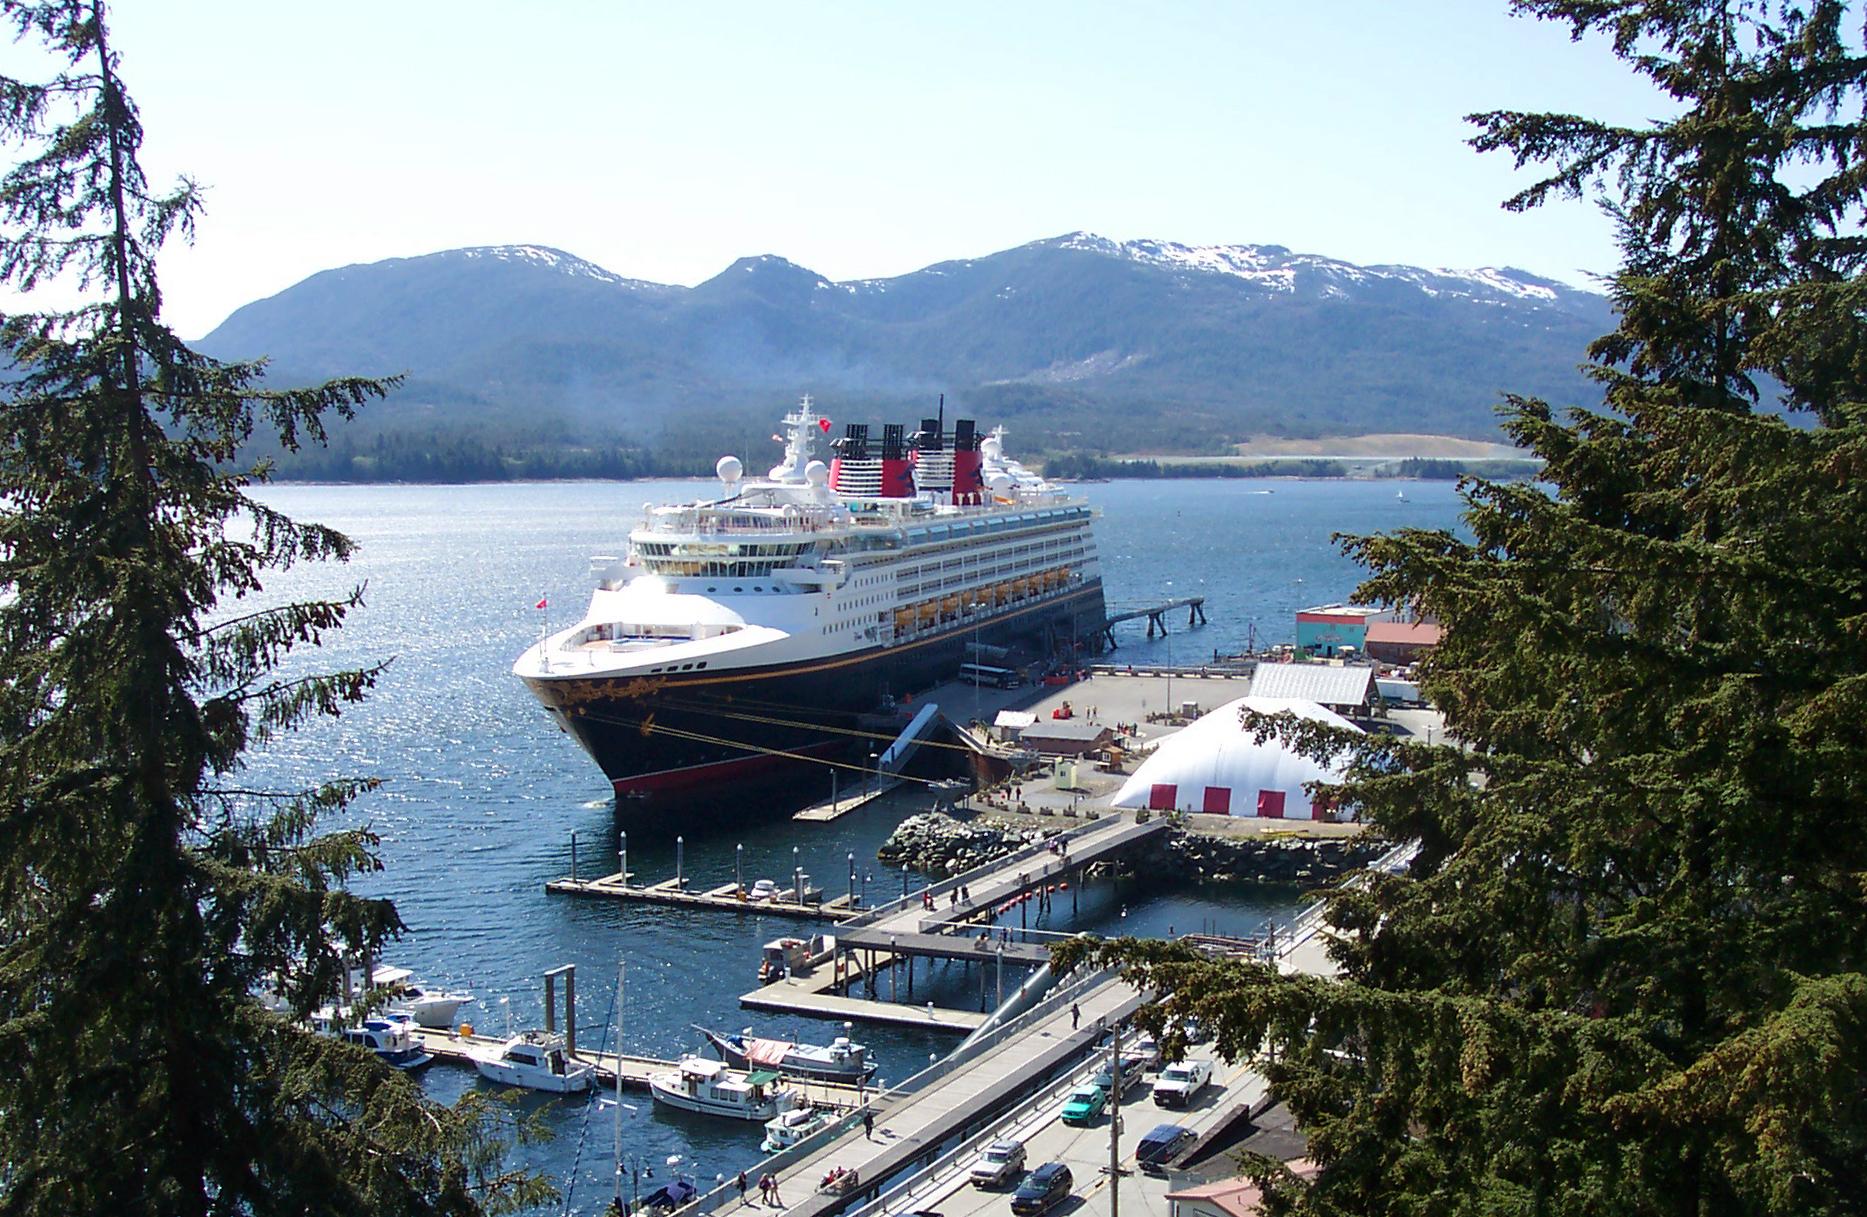 Disney Wonder at tied up at the cruise ship dock in Ketchikan